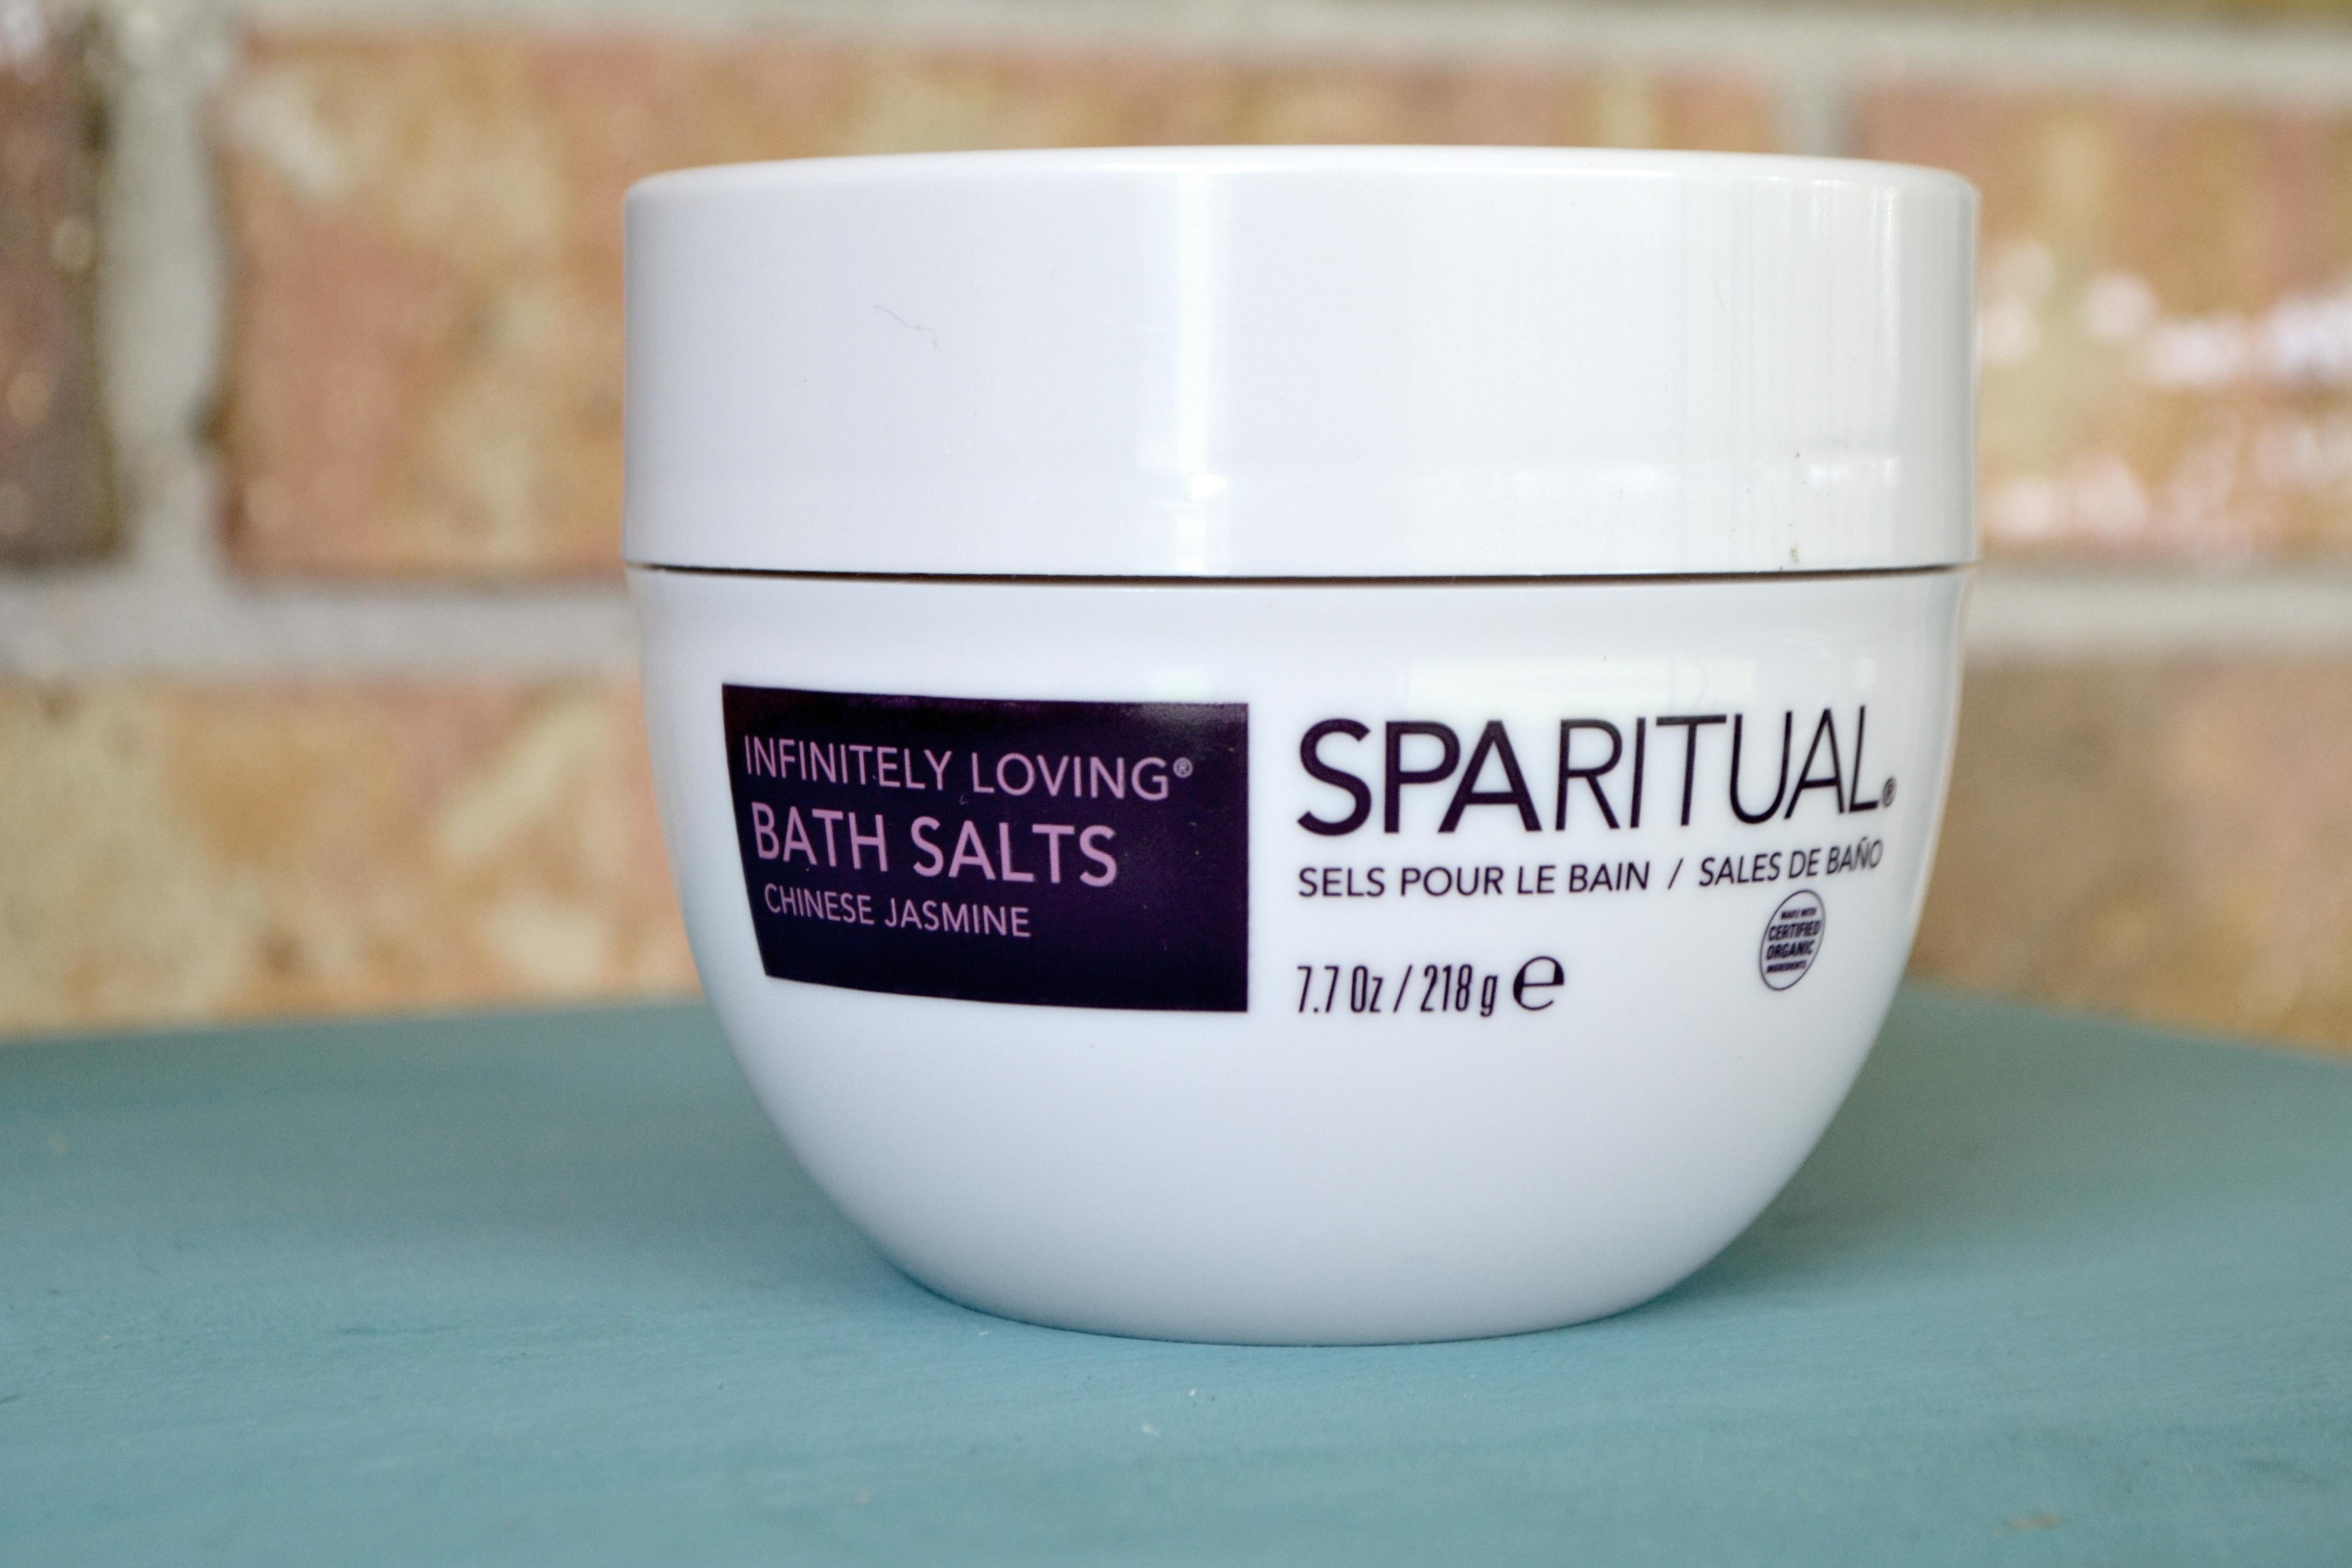 Product Pick: Sparitual Bath Salts